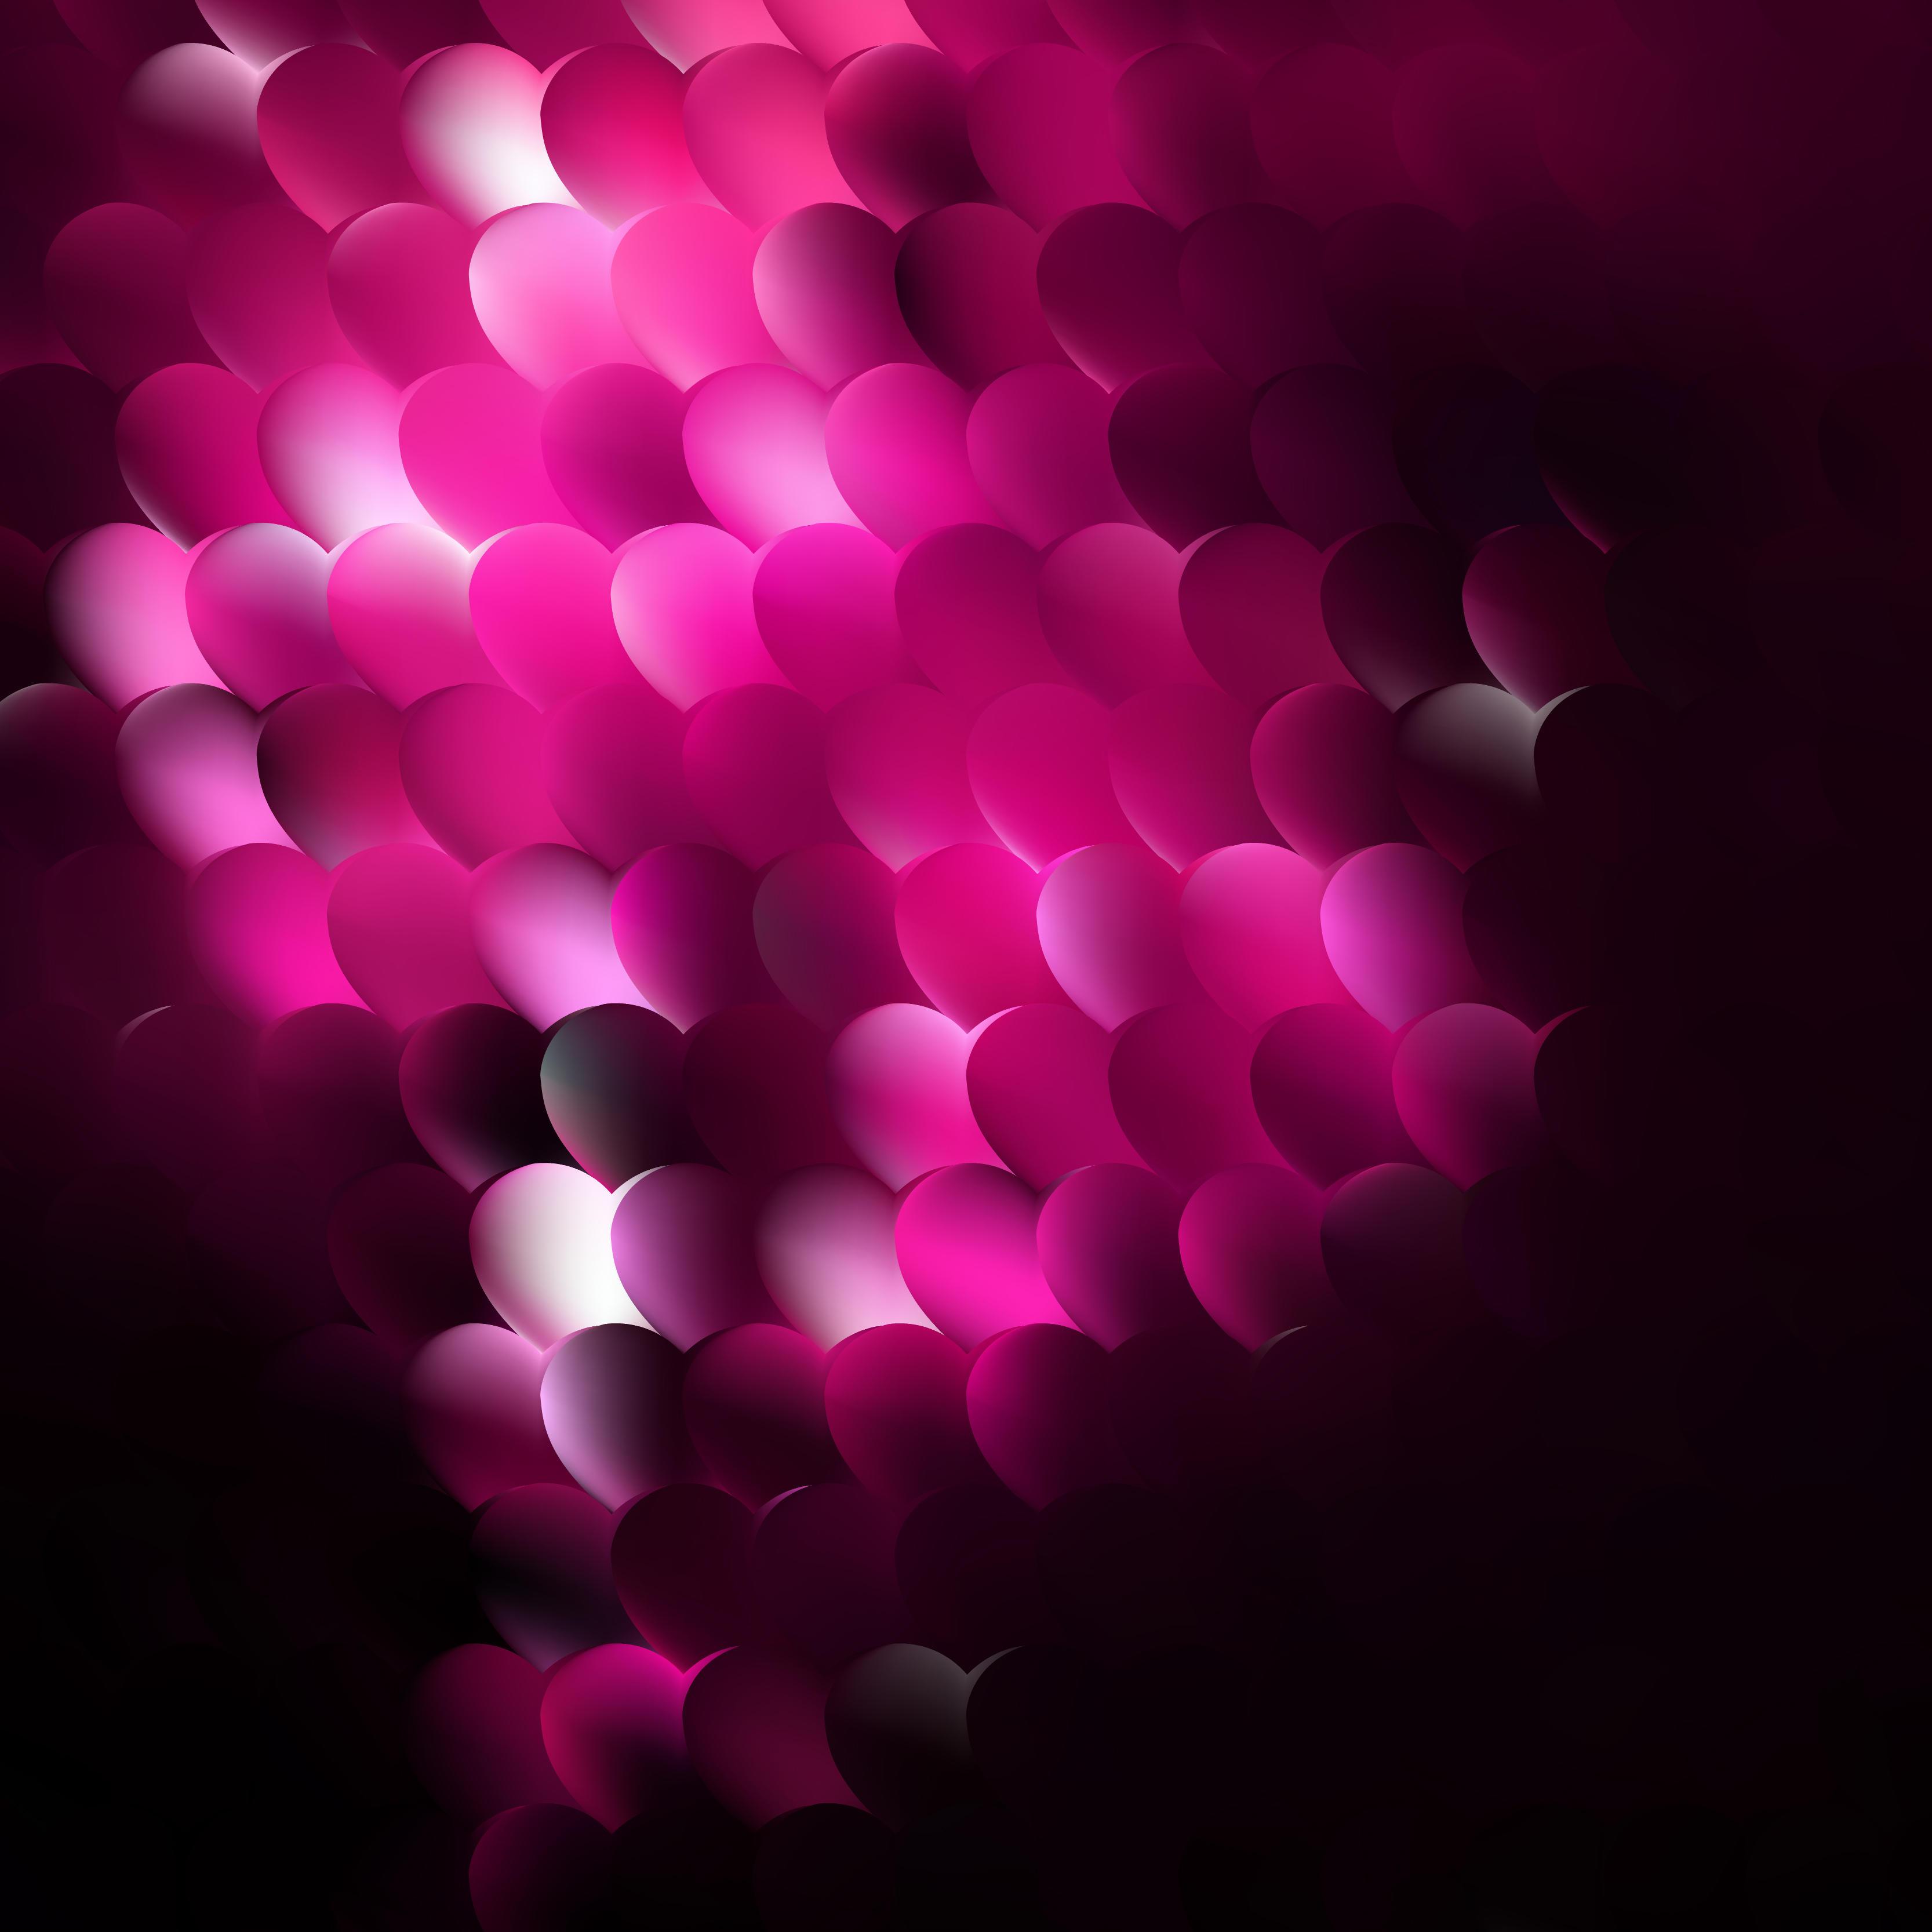 Background Design Black And Pink | Wallpaper sportstle